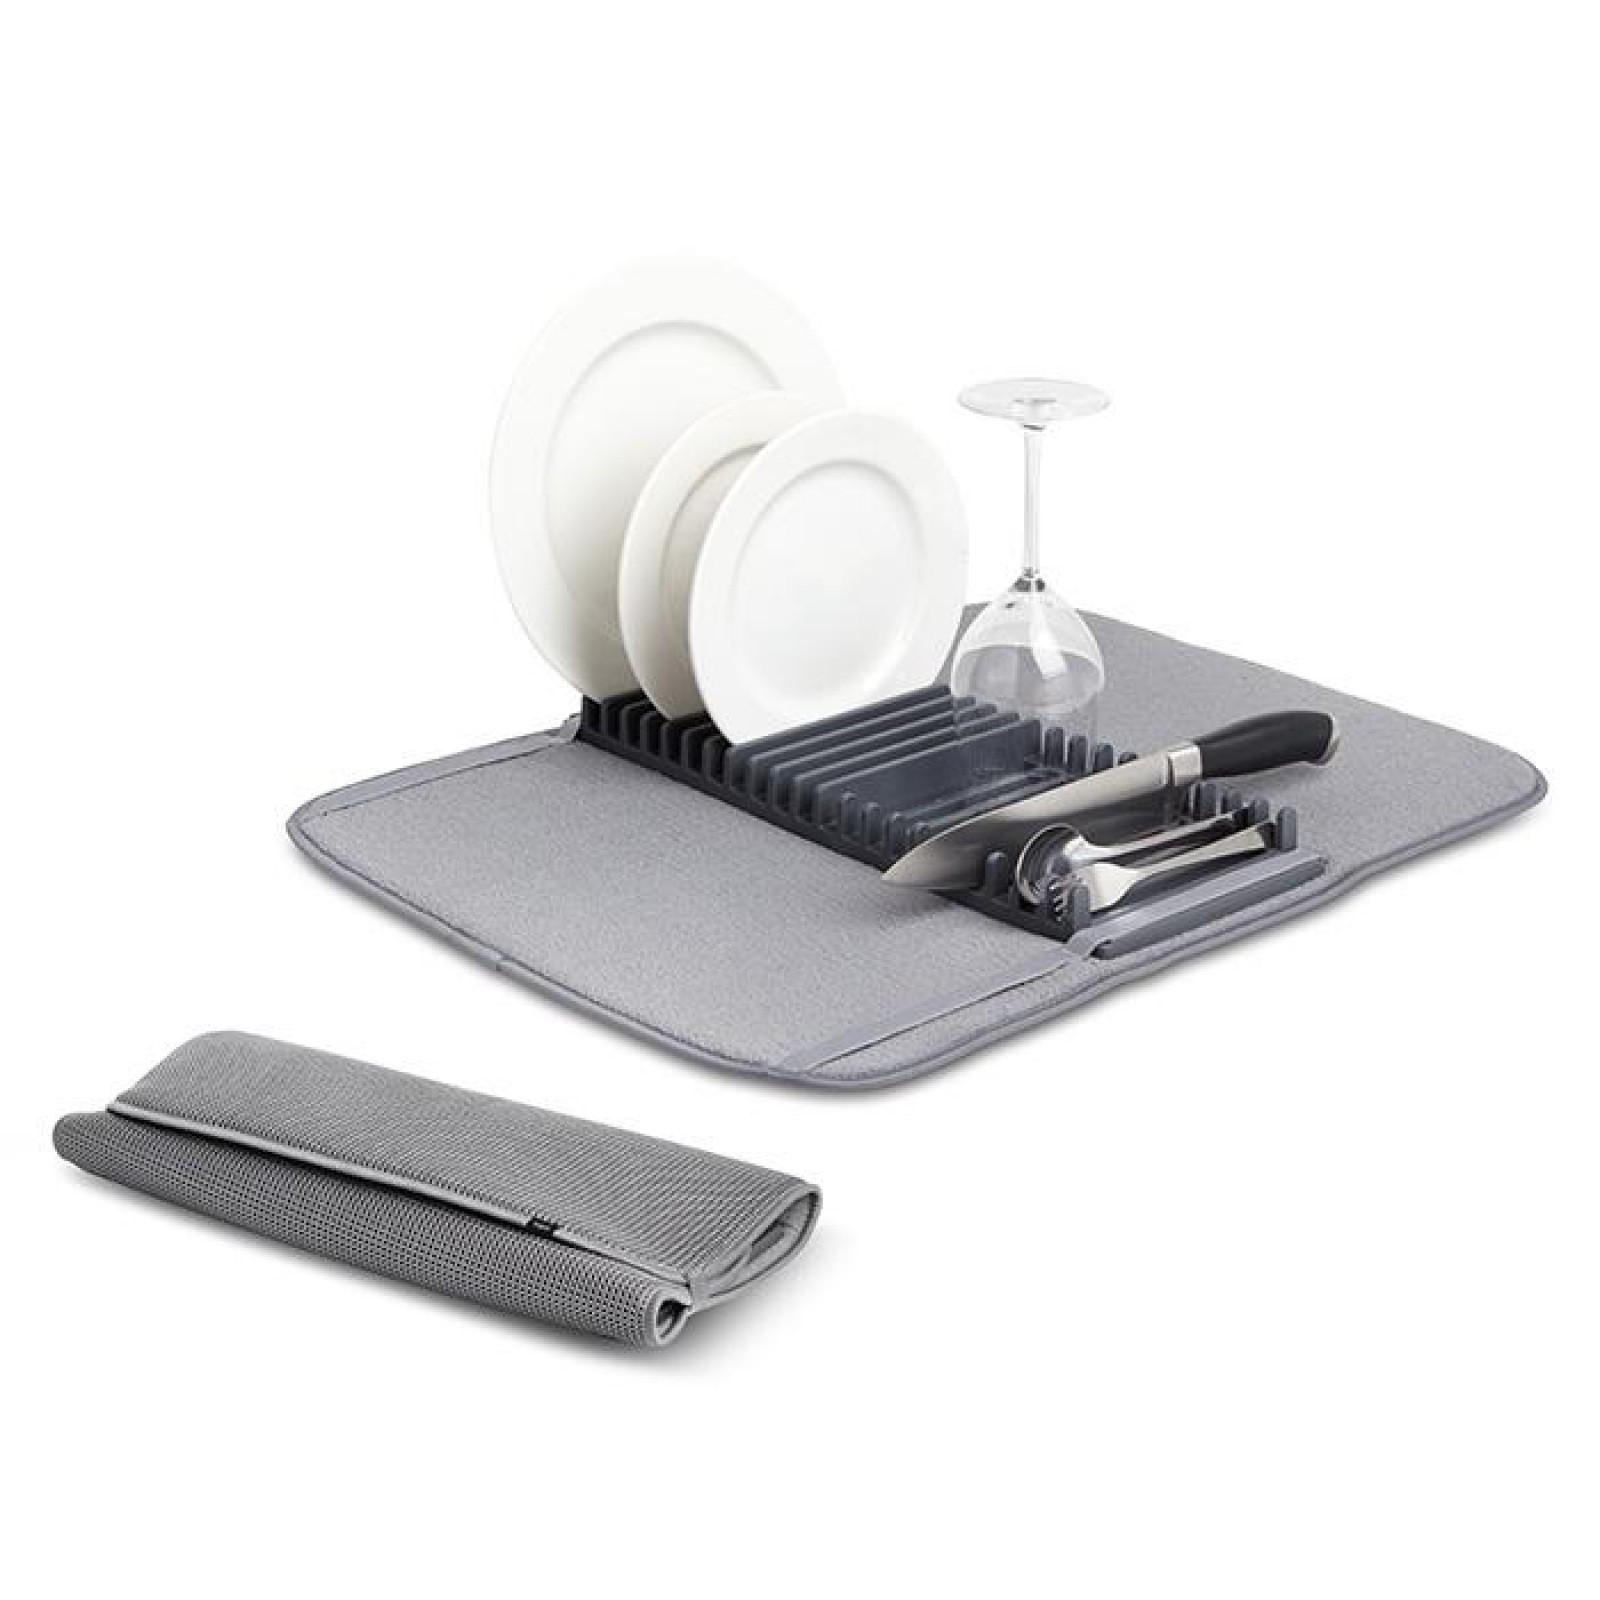 Udry Foldable Drying Mat (Charcoal) - Umbra